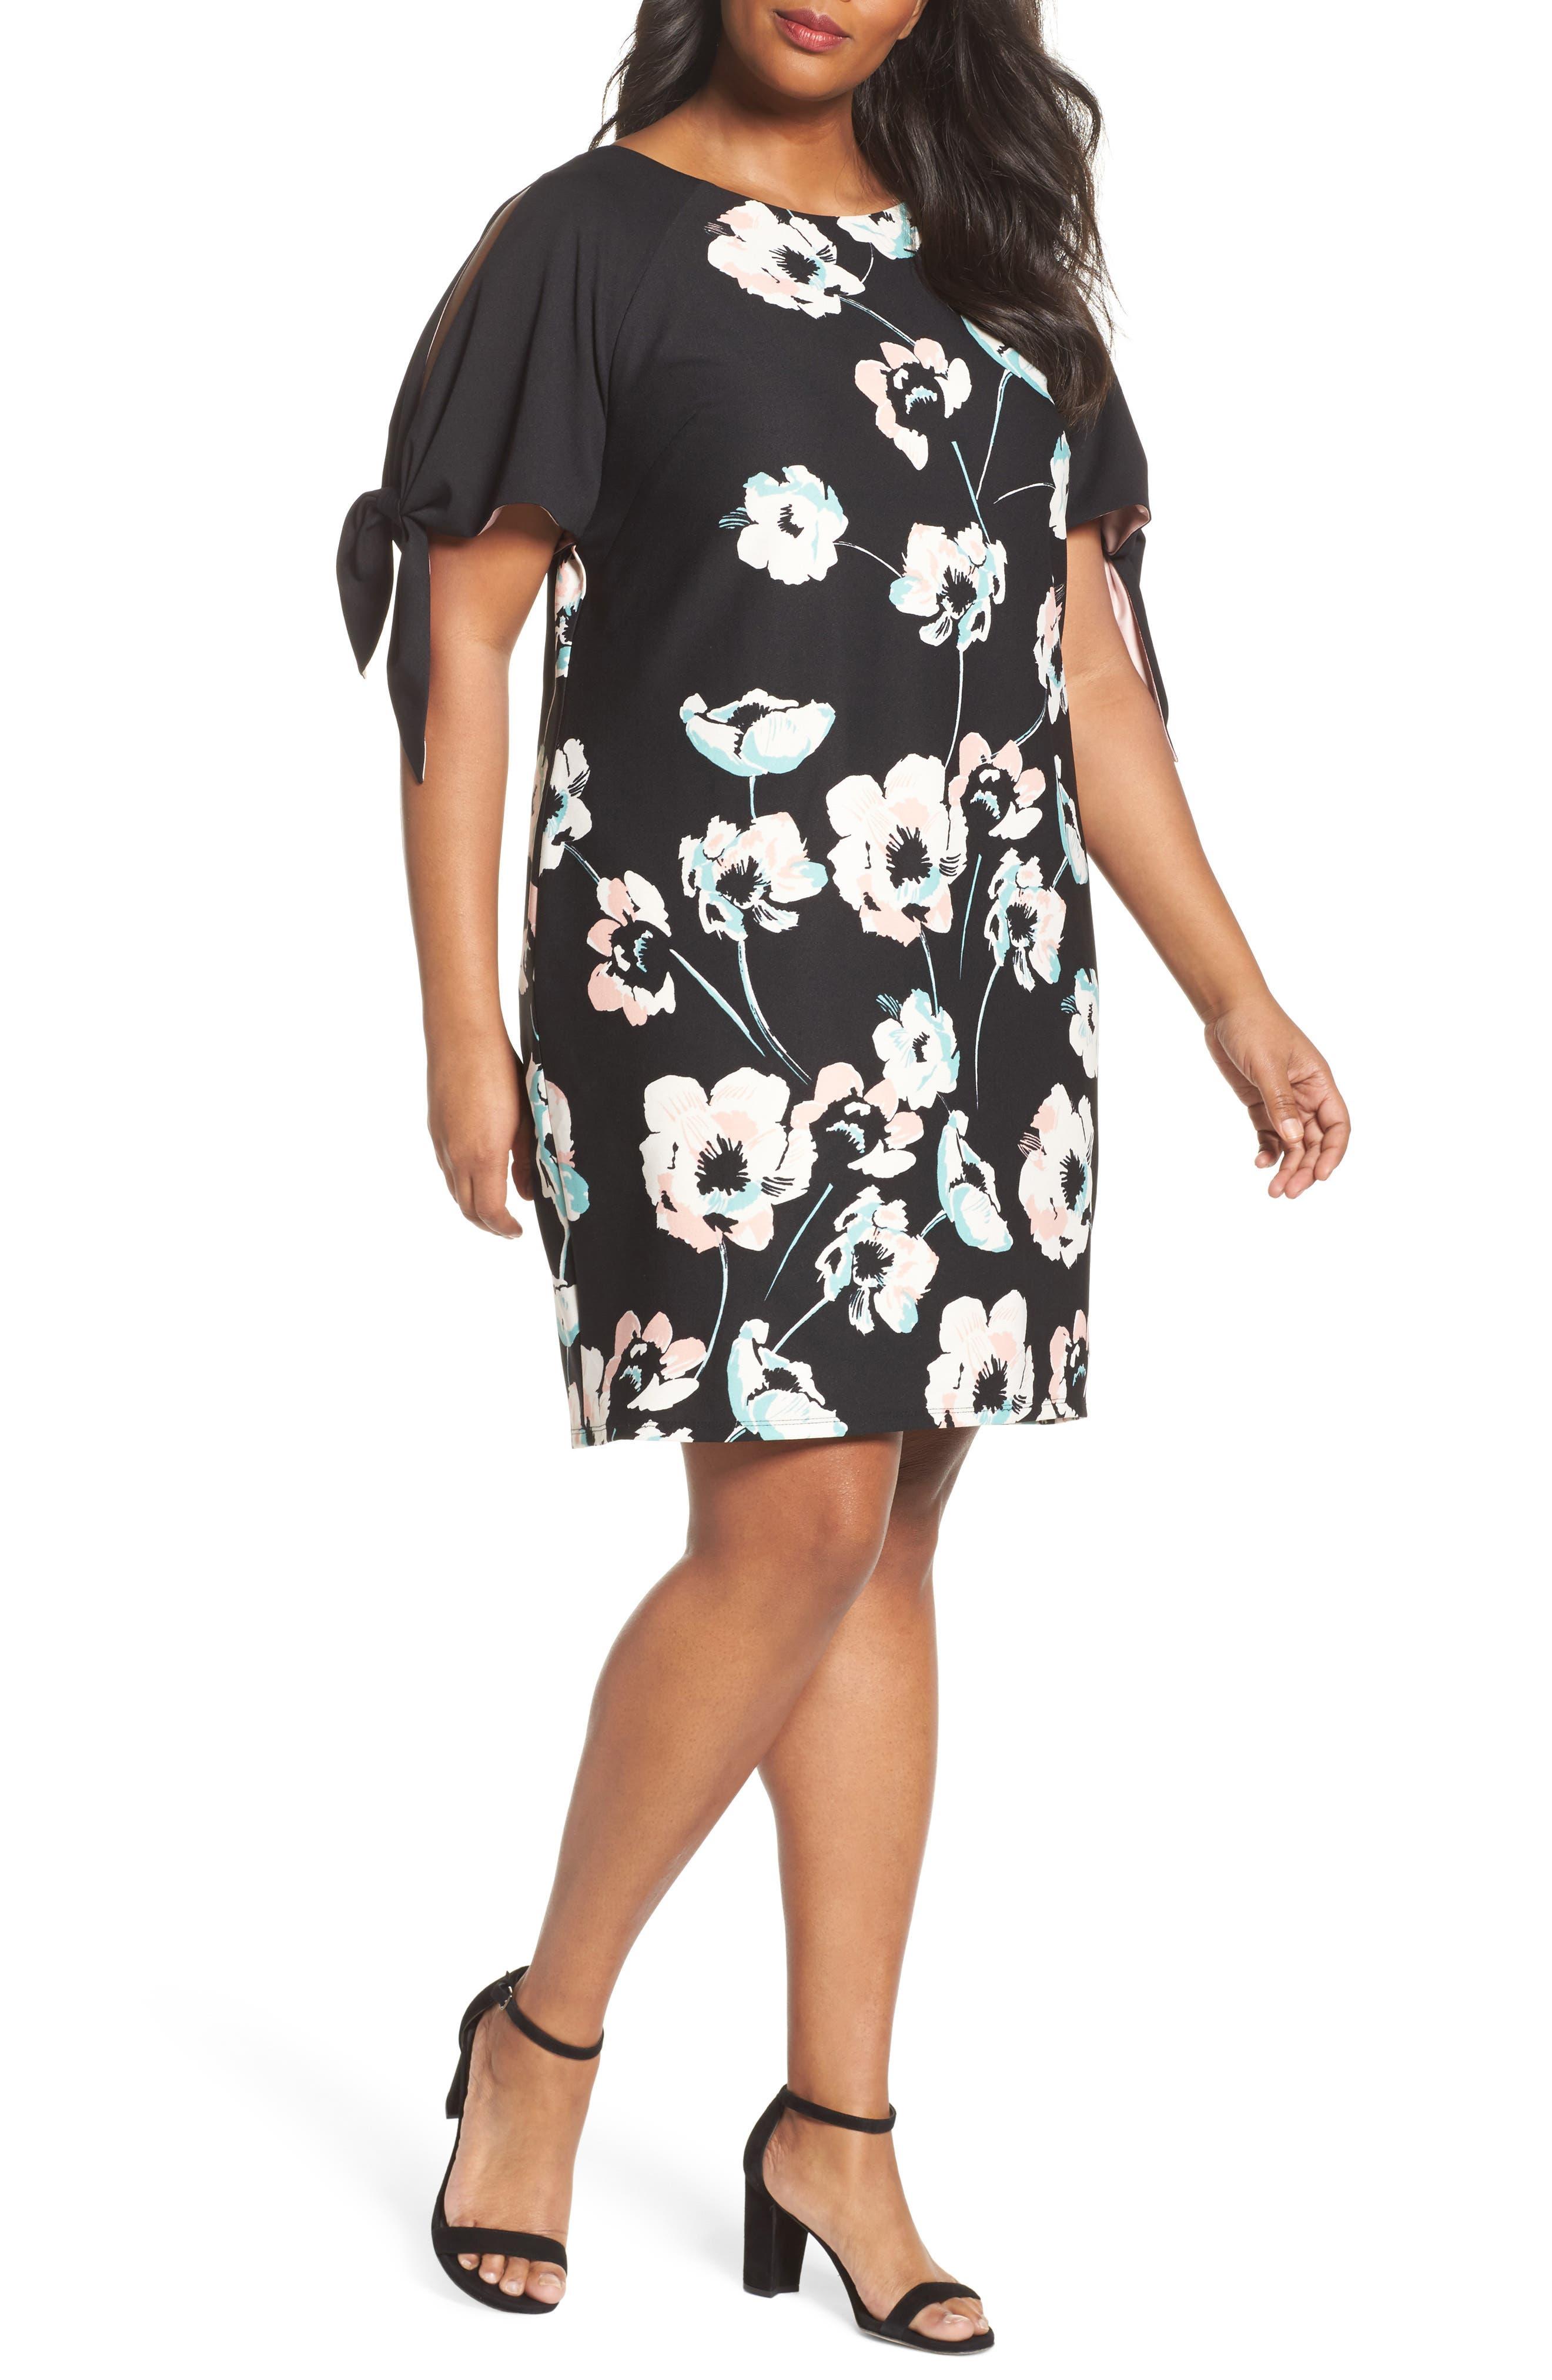 Alternate Image 1 Selected - Vince Camuto Slit Sleeve Floral Shift Dress (Plus Size)